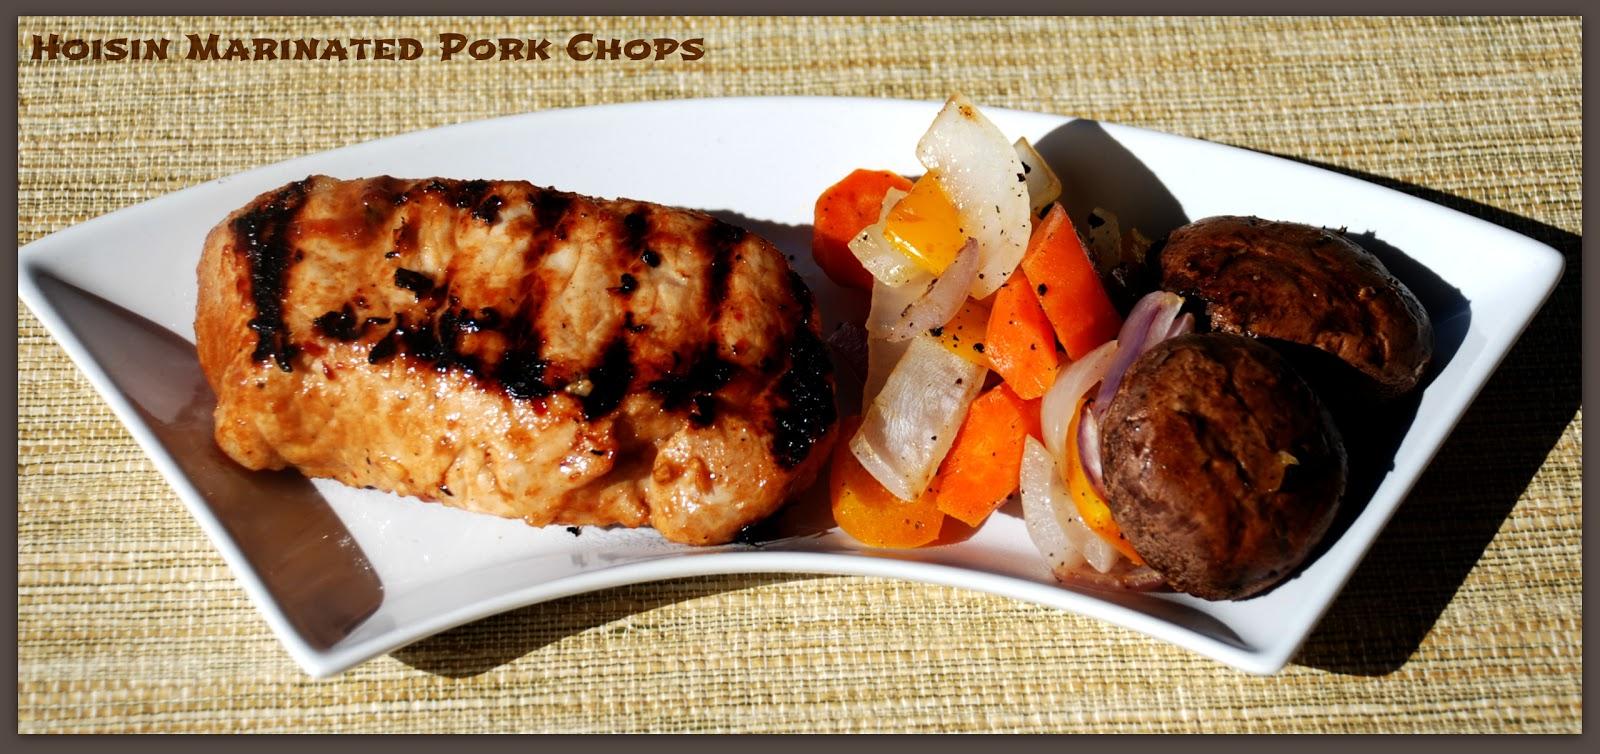 Hoisin Marinated Pork Chops